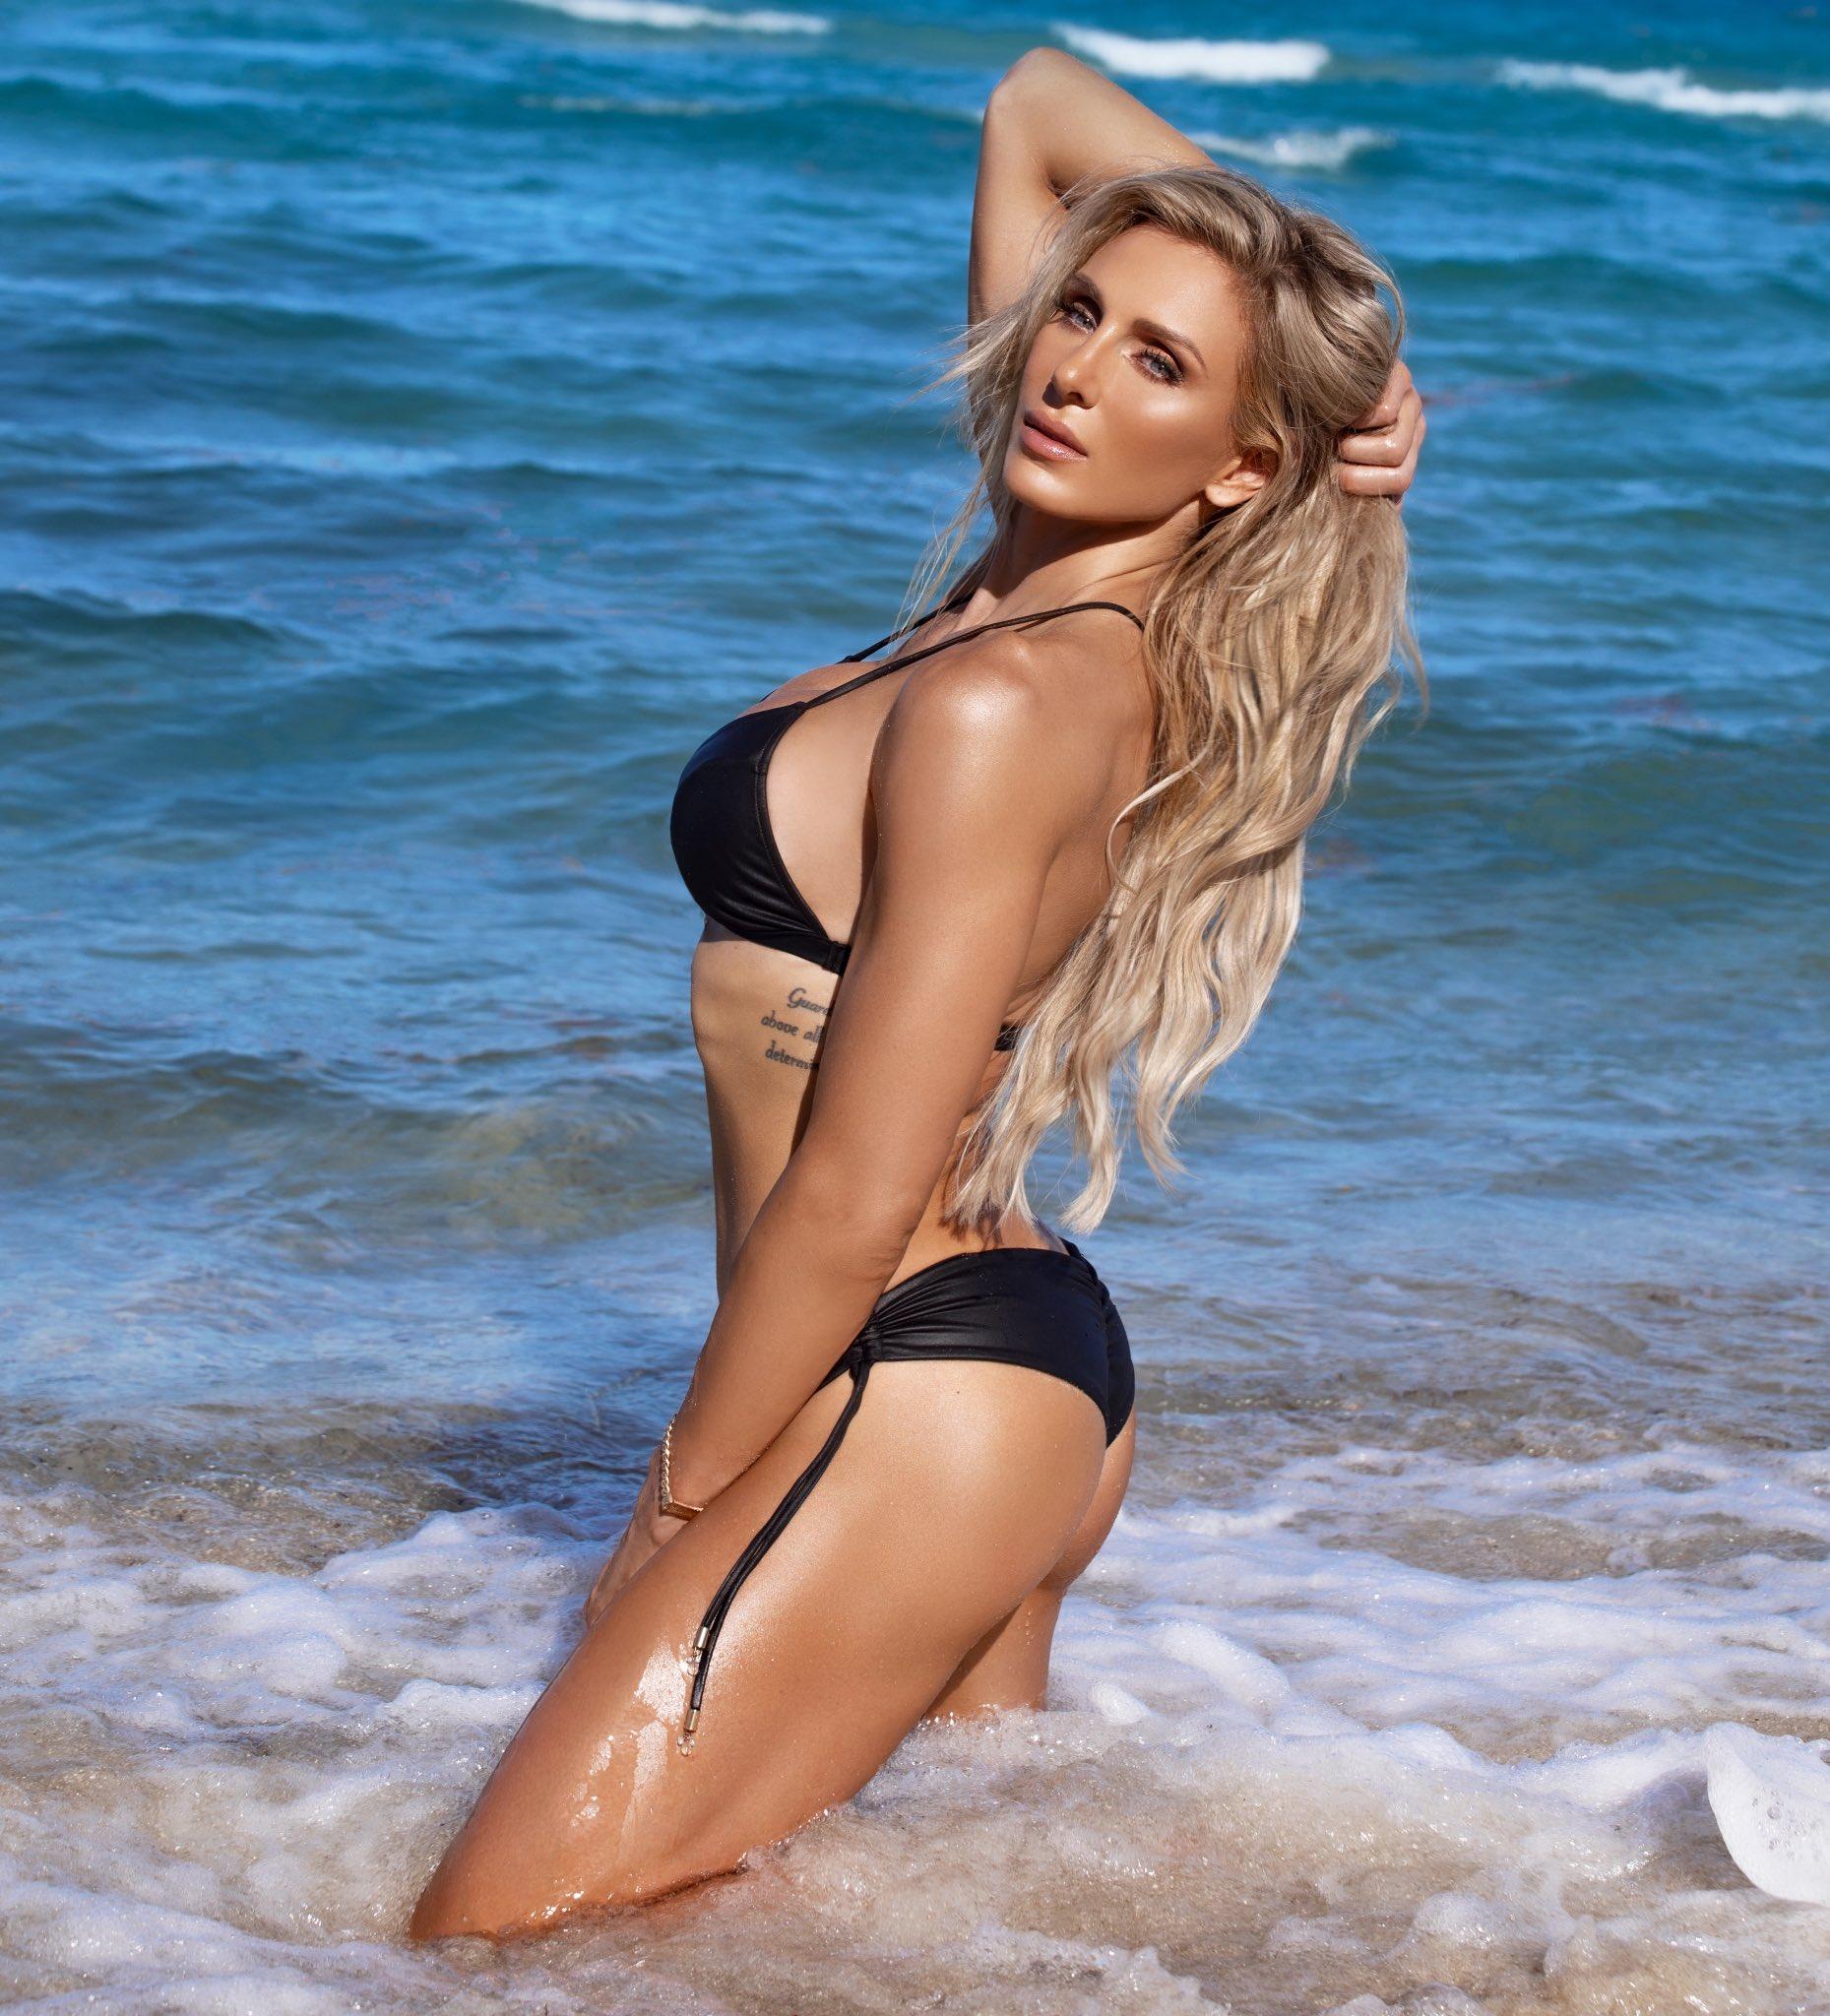 Charlotte Flair Trolled By WWE Star Alexa Bliss Over Latest Bikini Photo 50